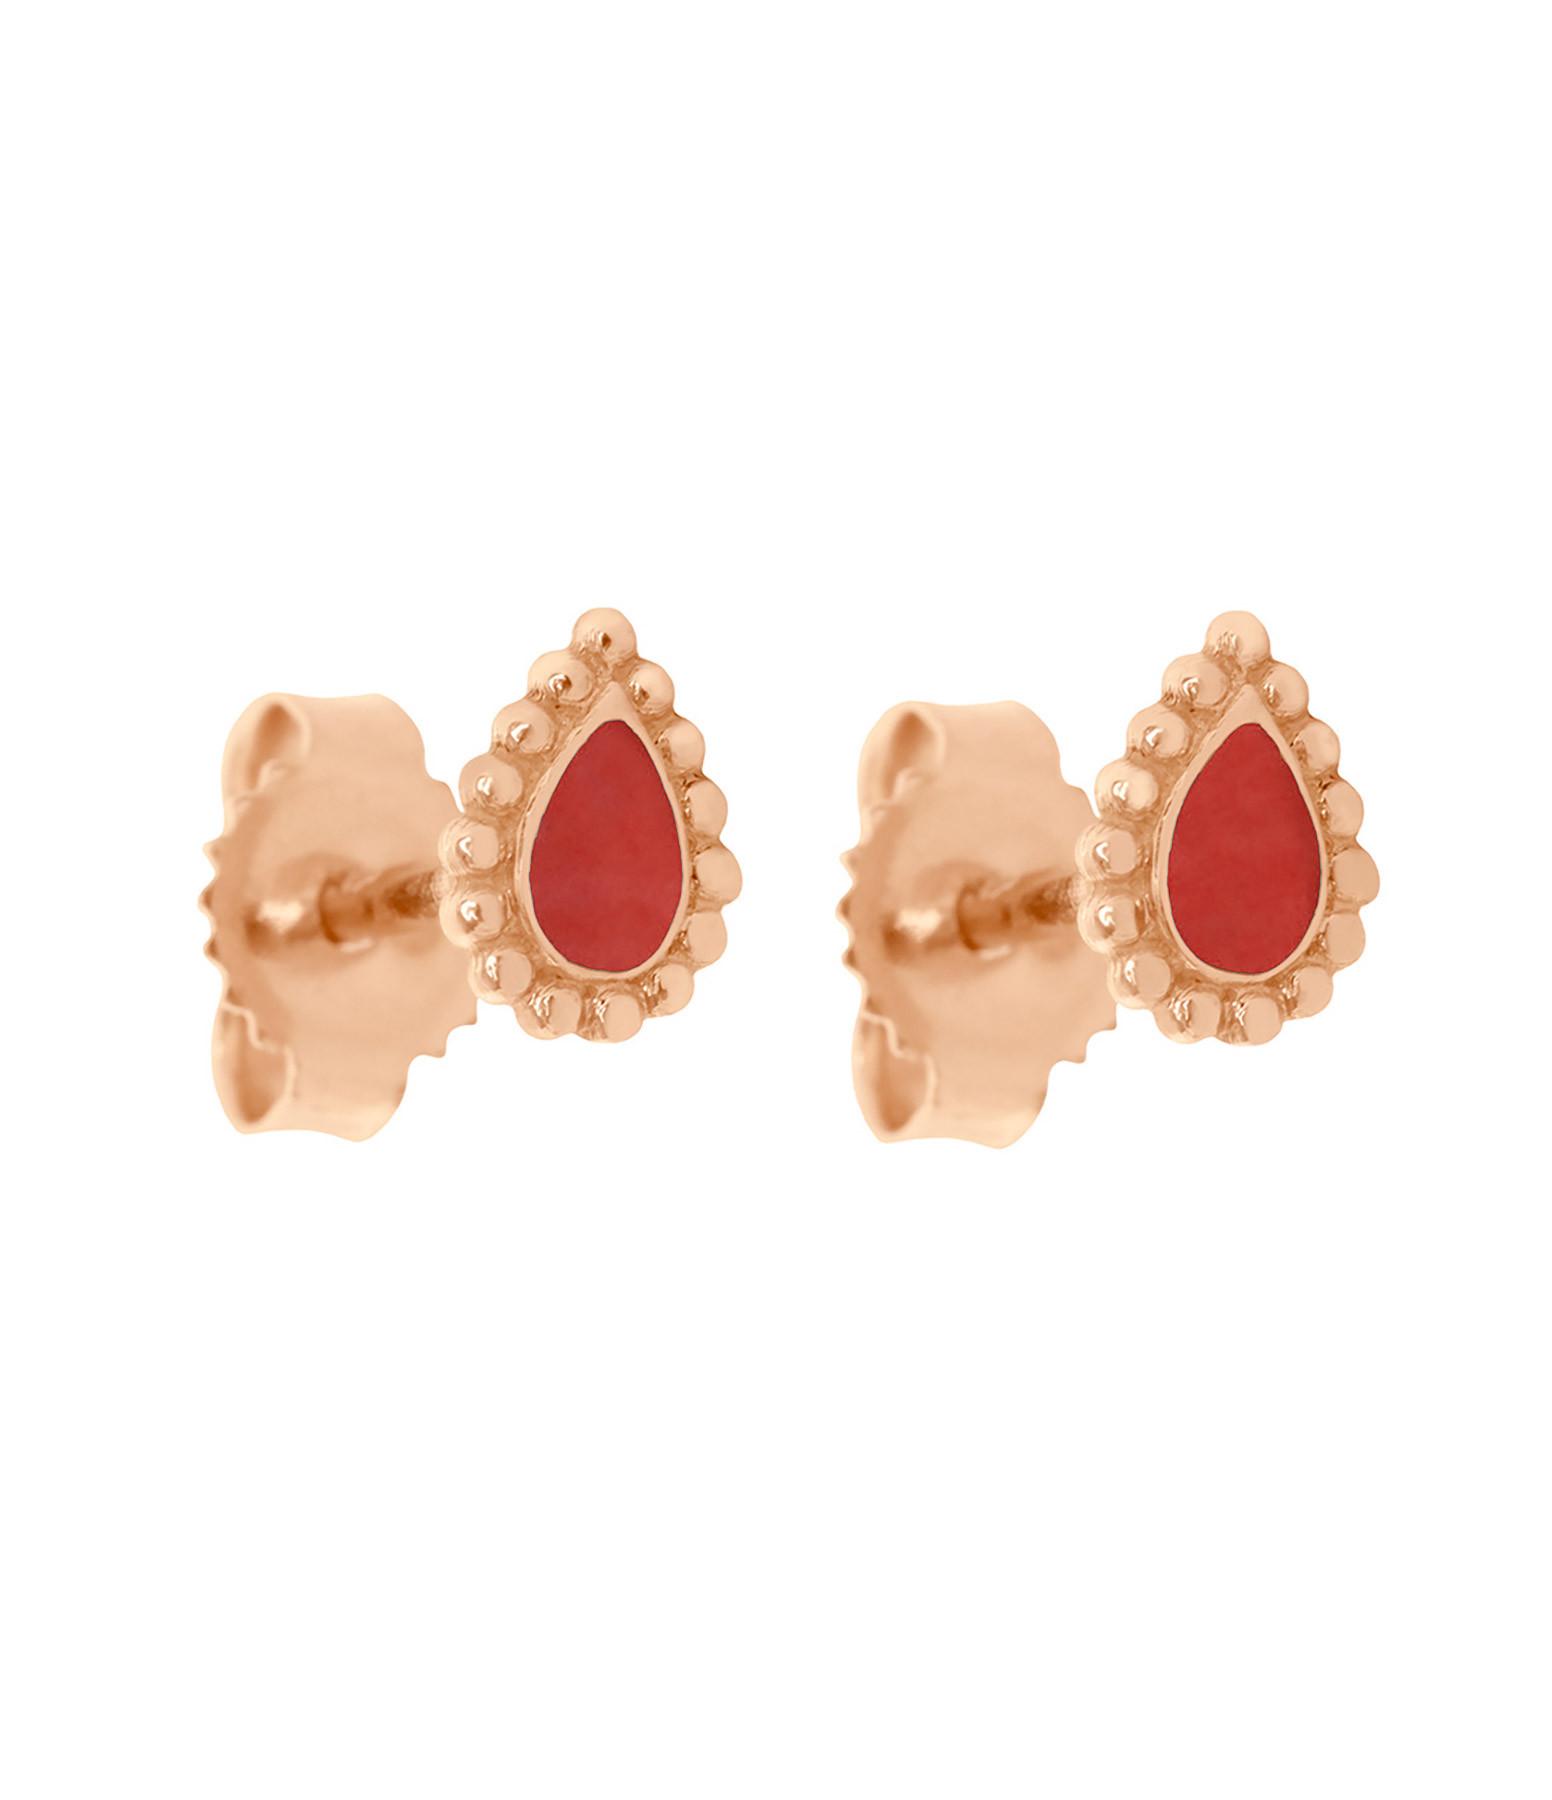 GIGI CLOZEAU - Boucles d'oreilles Lucky Cachemire Email OR